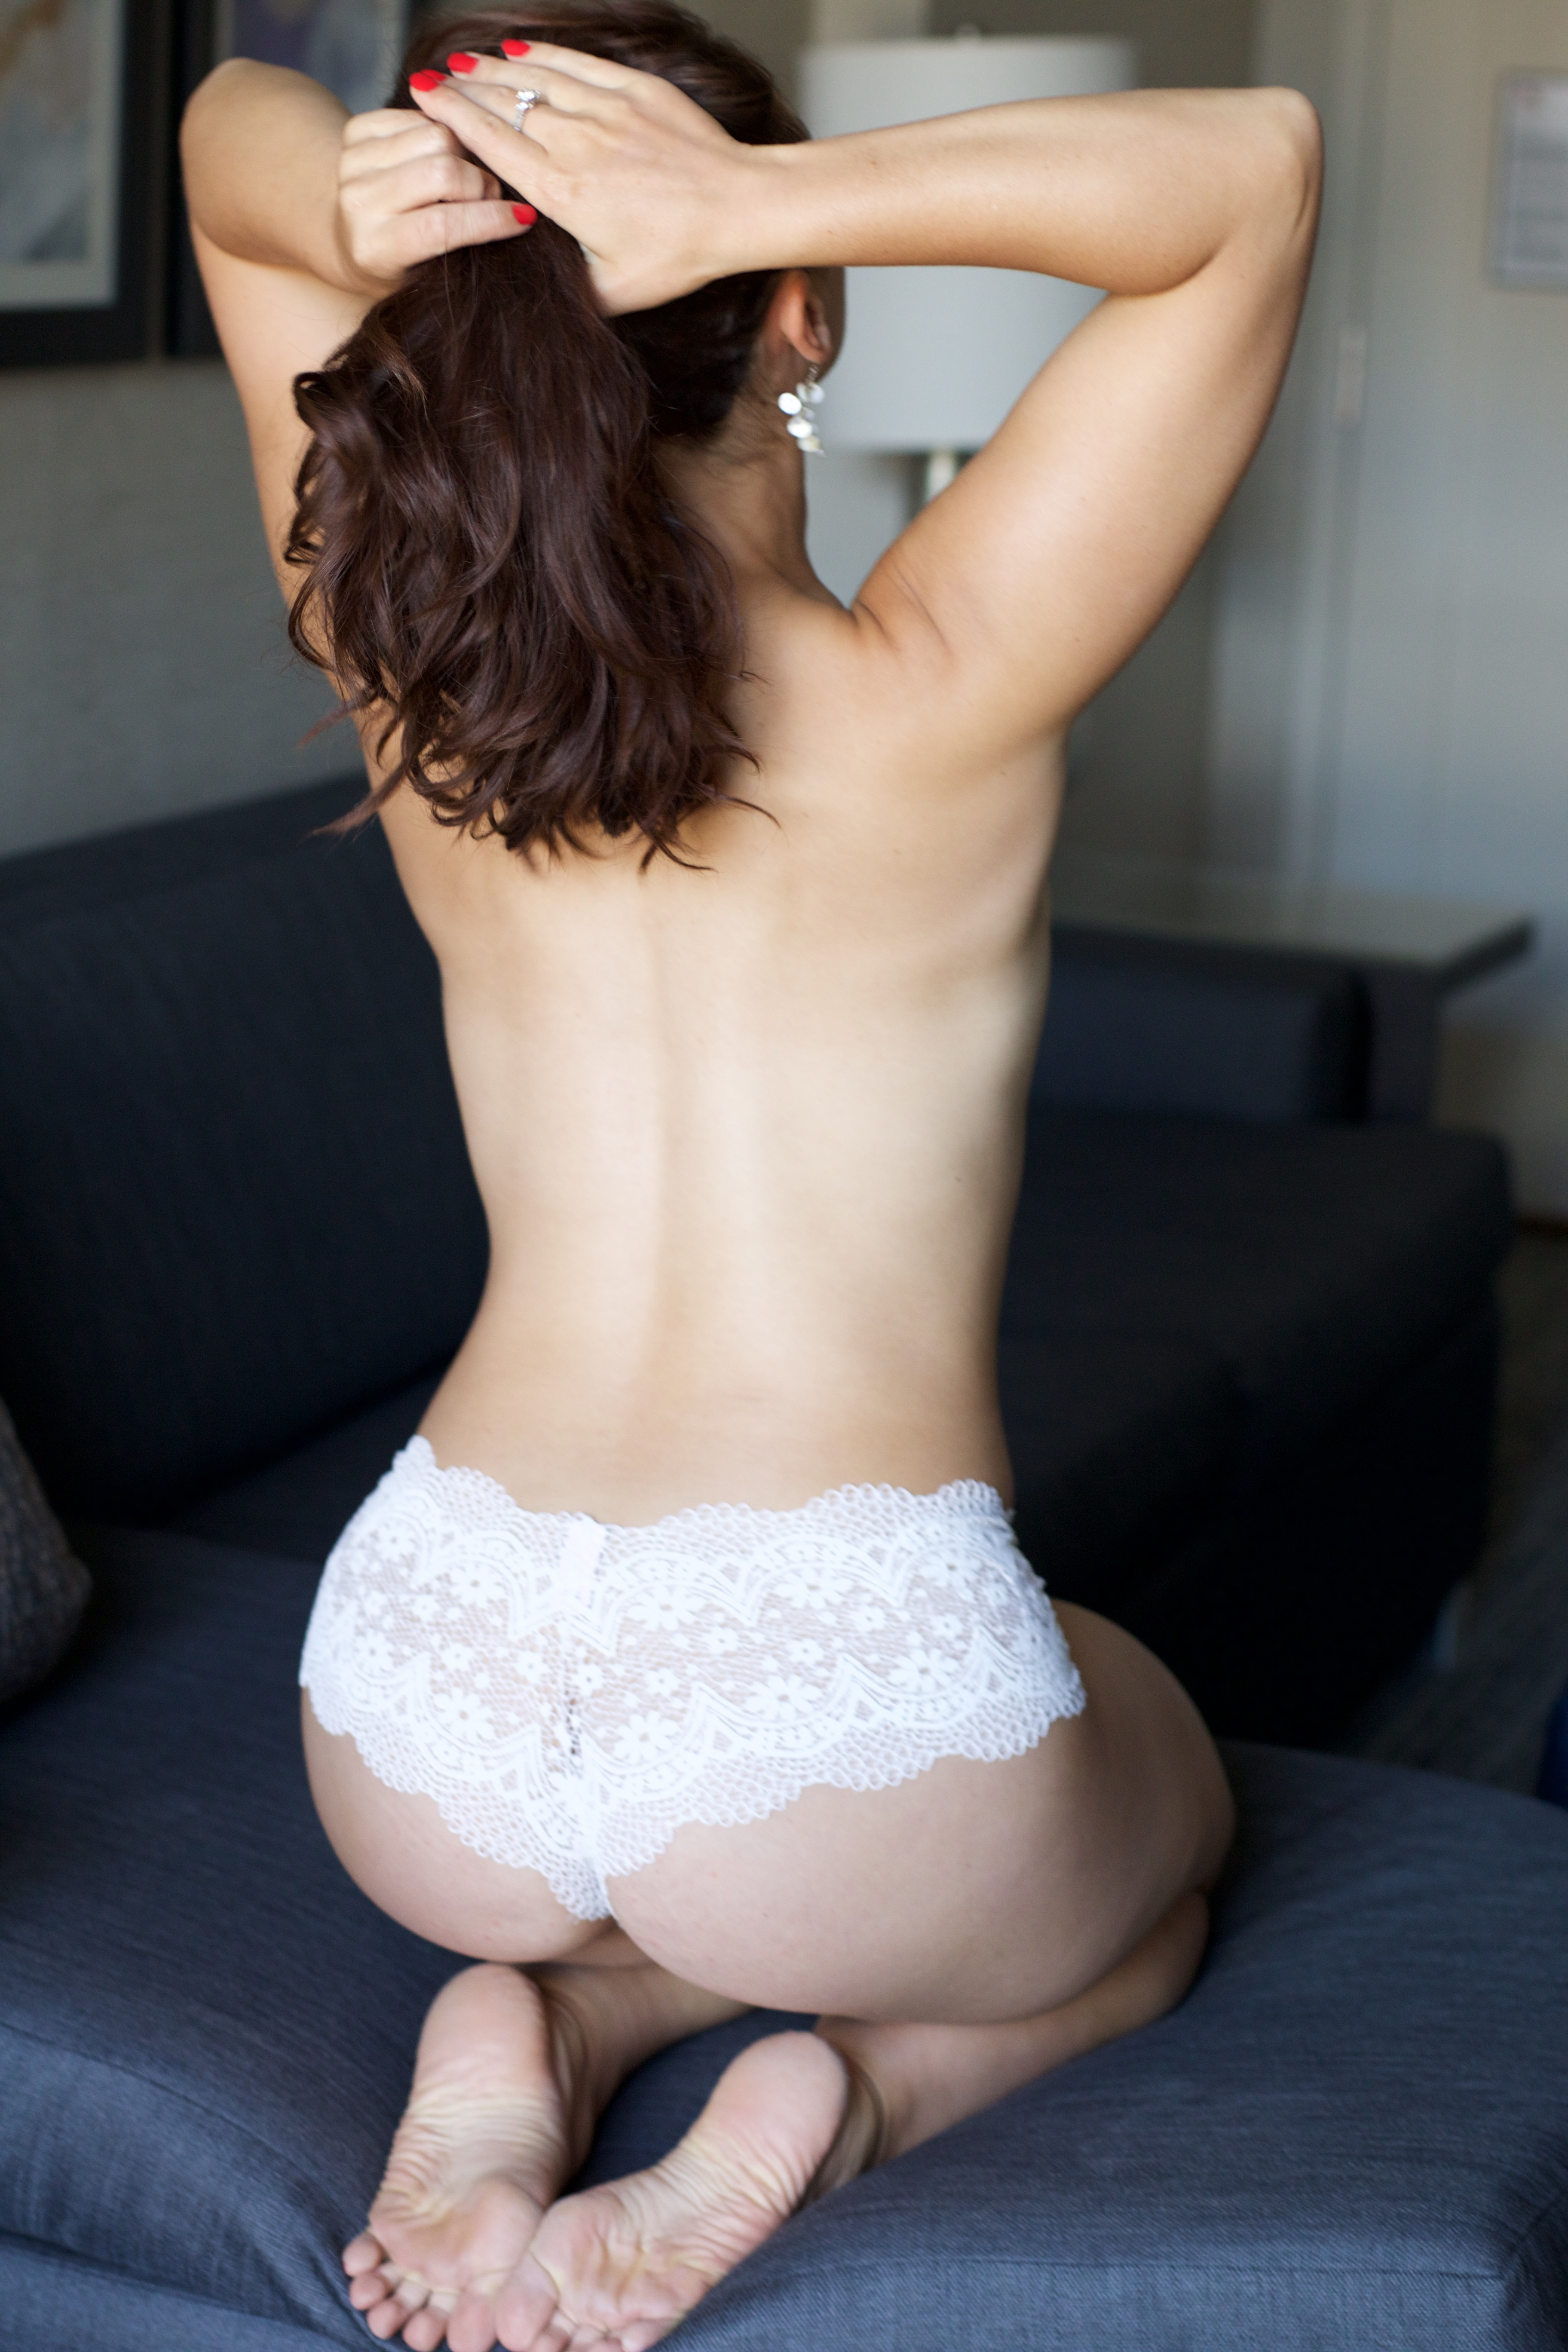 Elizabeth Dean